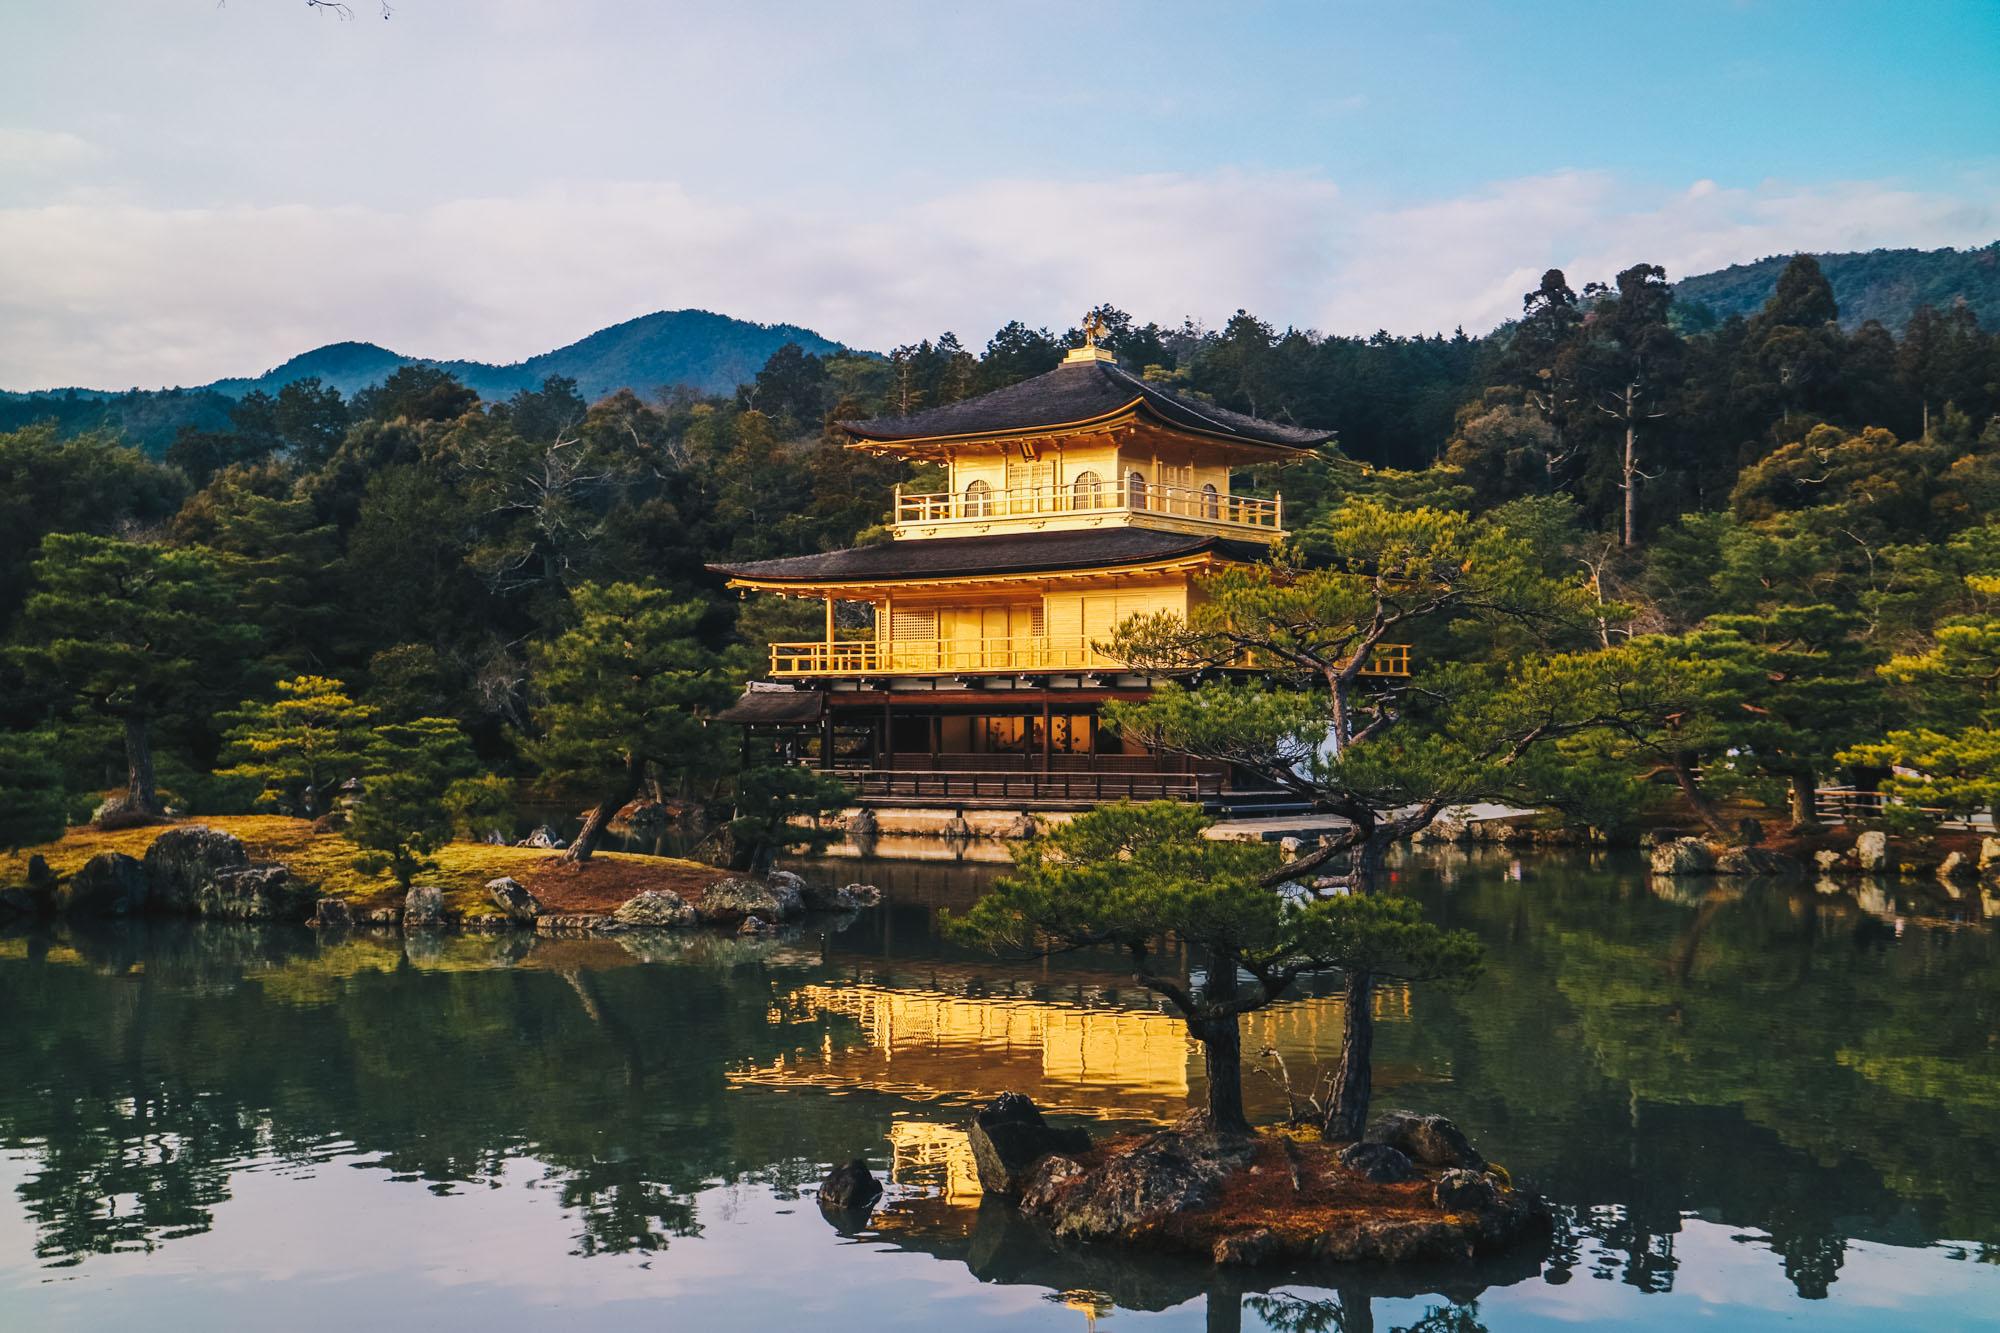 Kinkakuji-Golden-Pavilion-kyoto-japan-darrenbloggie